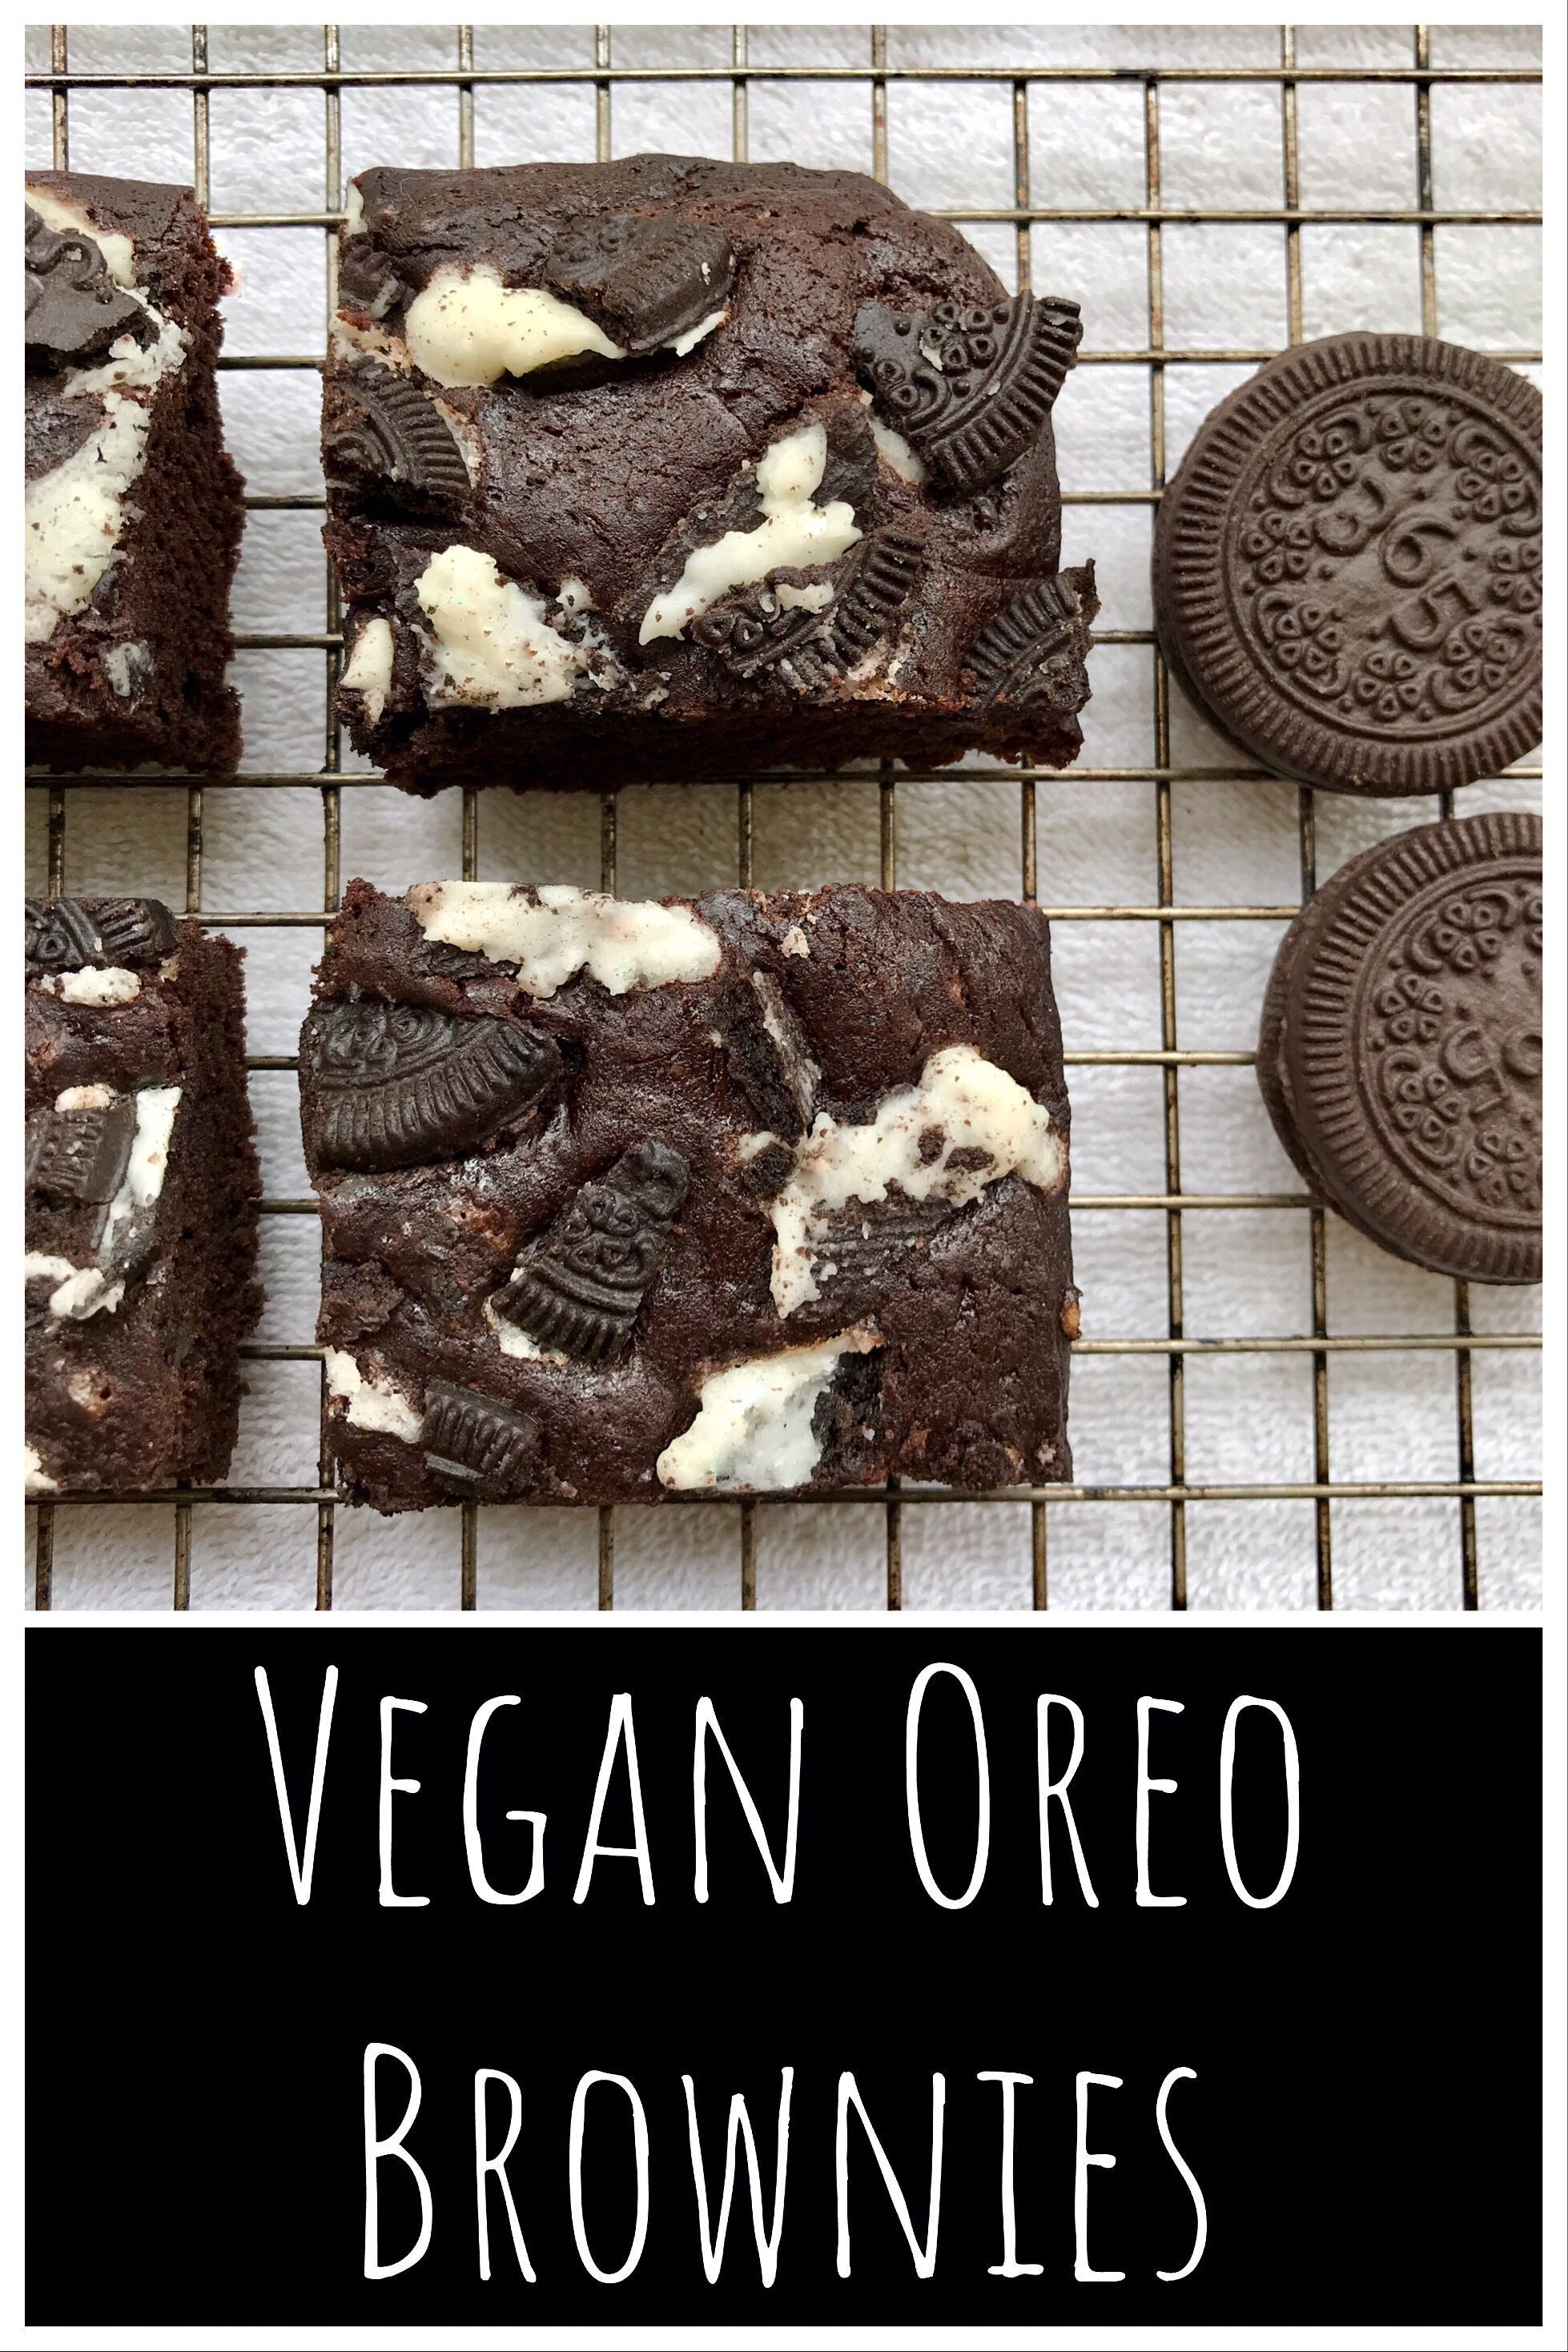 Oreo Brownies - Food by Ayaka Brownies - Food by Ayaka